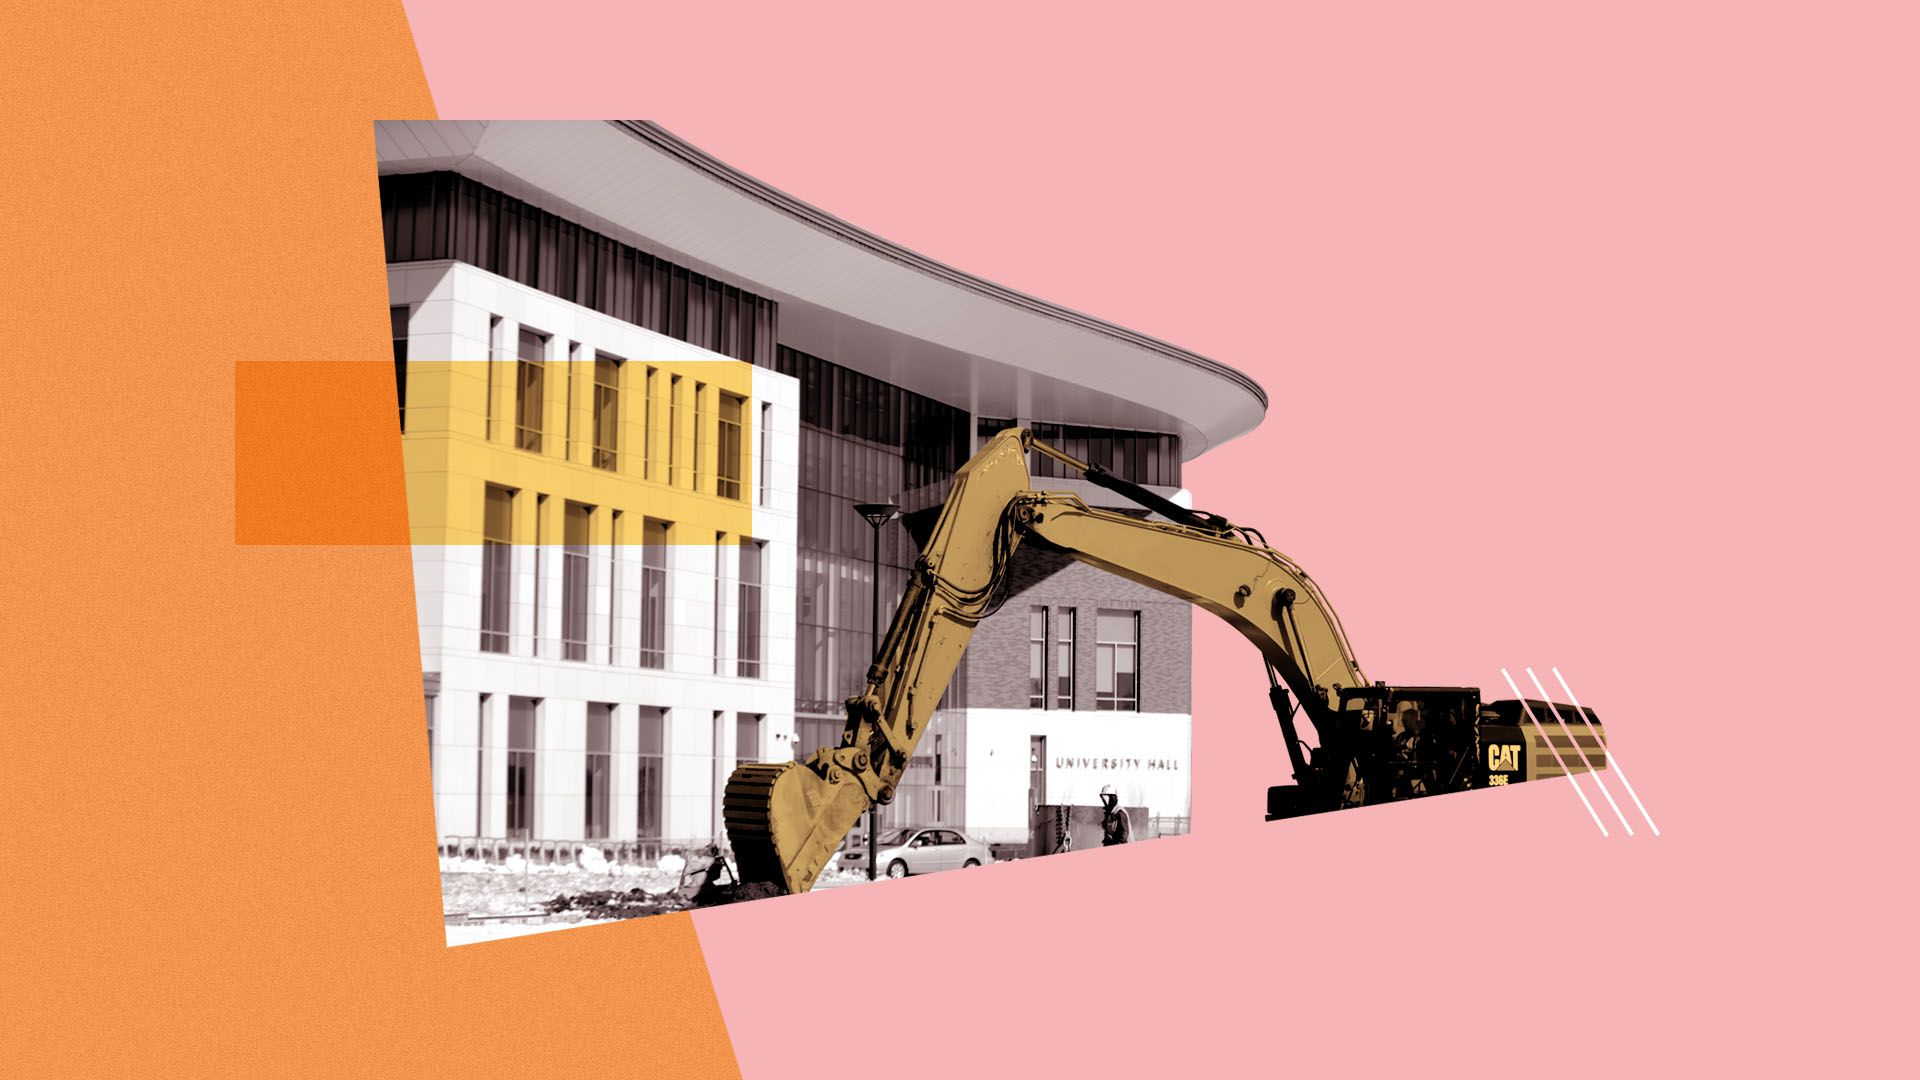 5. The overbuilt campus